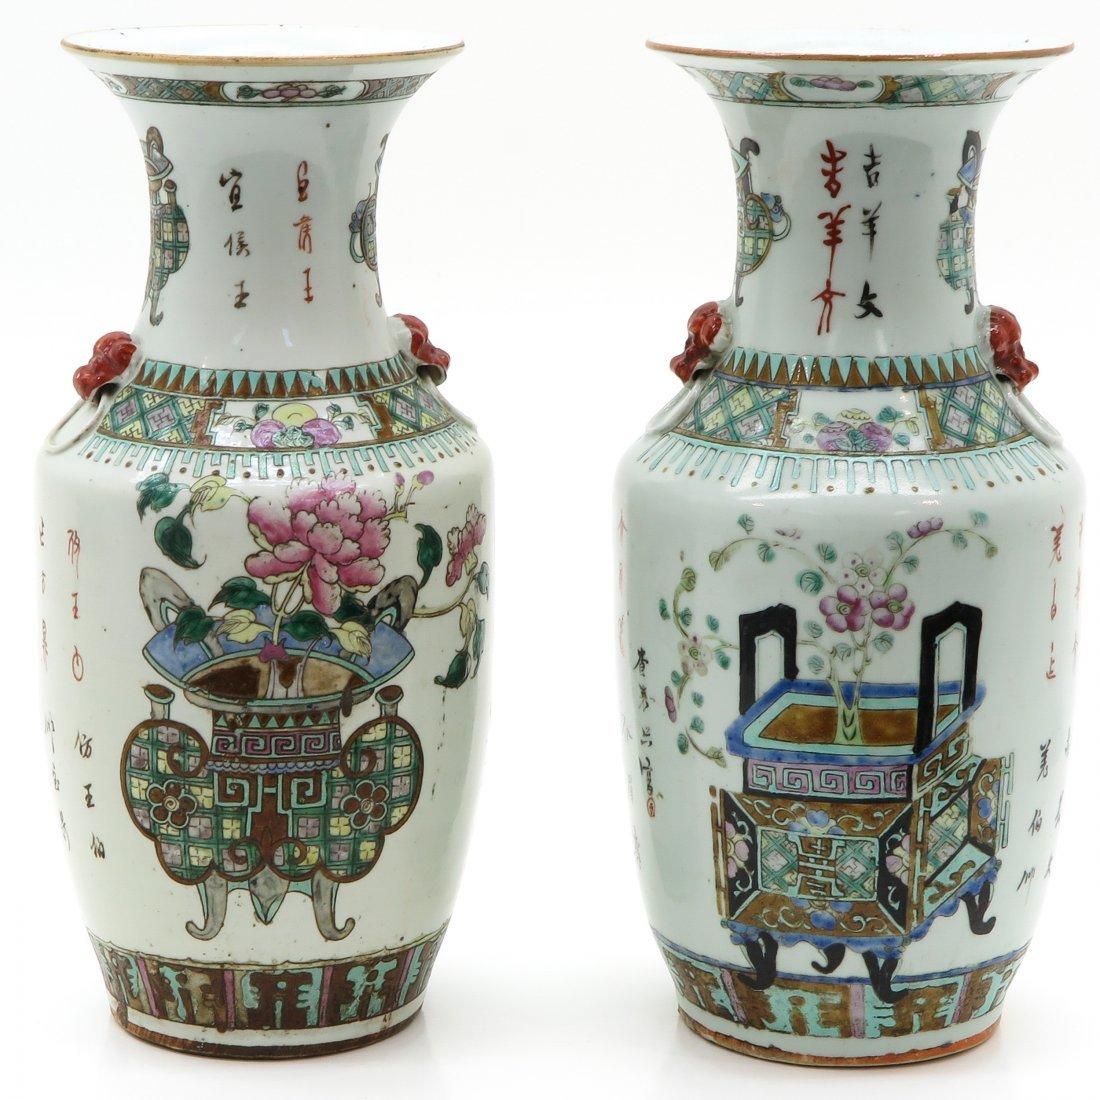 Pair of China Porcelain Vases Circa 1900